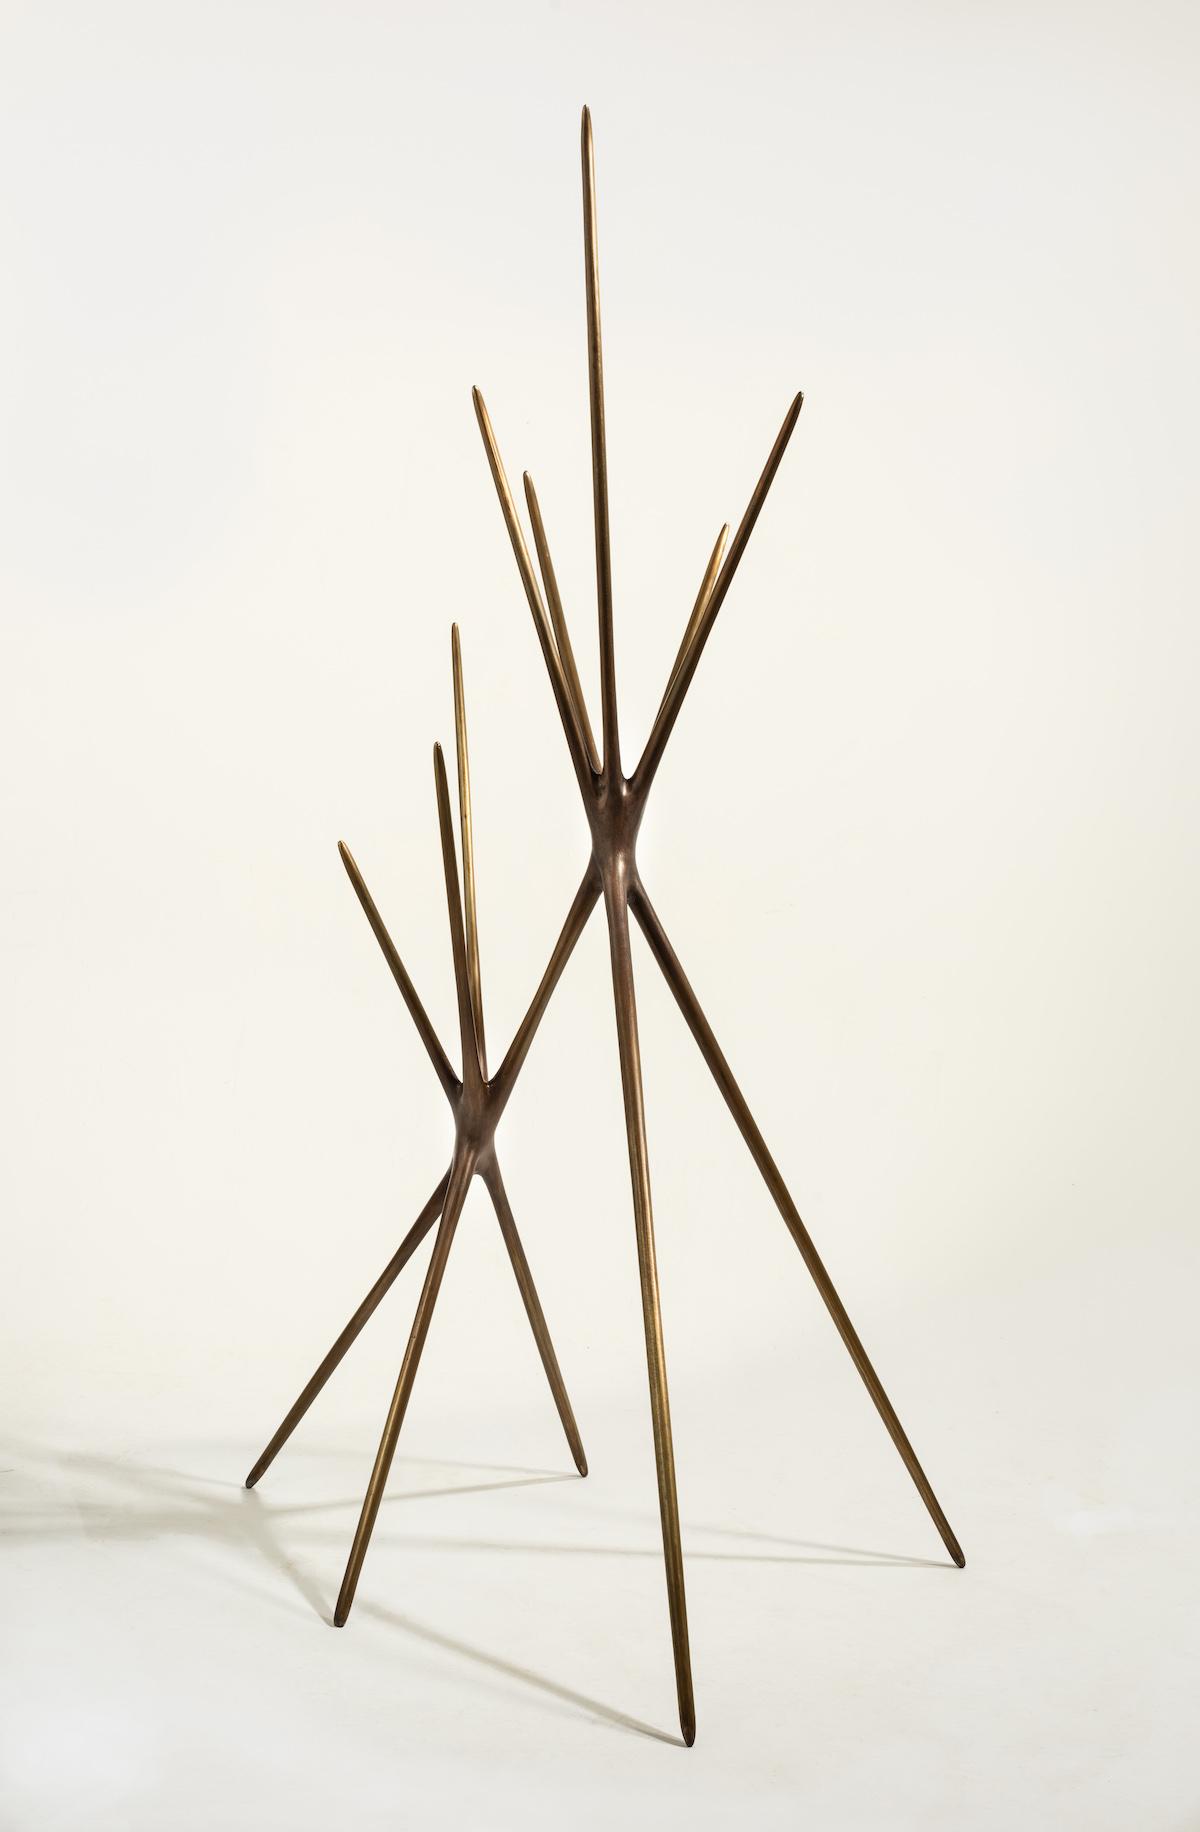 Untitled (Standing Sculpture) by Christopher Kurtz